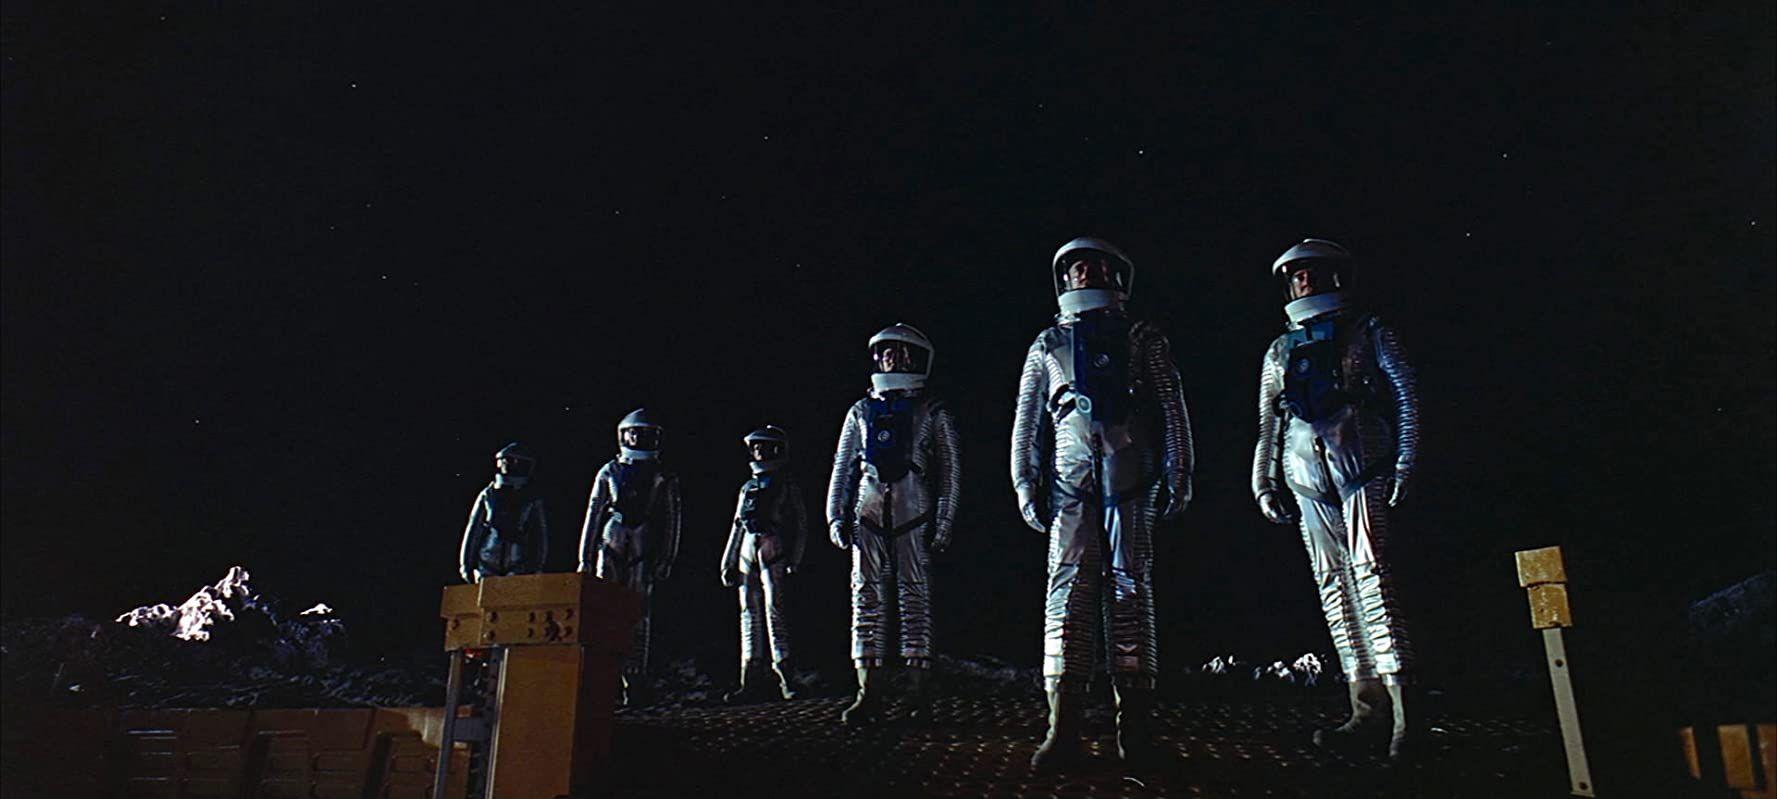 2001 Odissea Nello Spazio 1968 Space Odyssey Space Movies 2001 A Space Odyssey